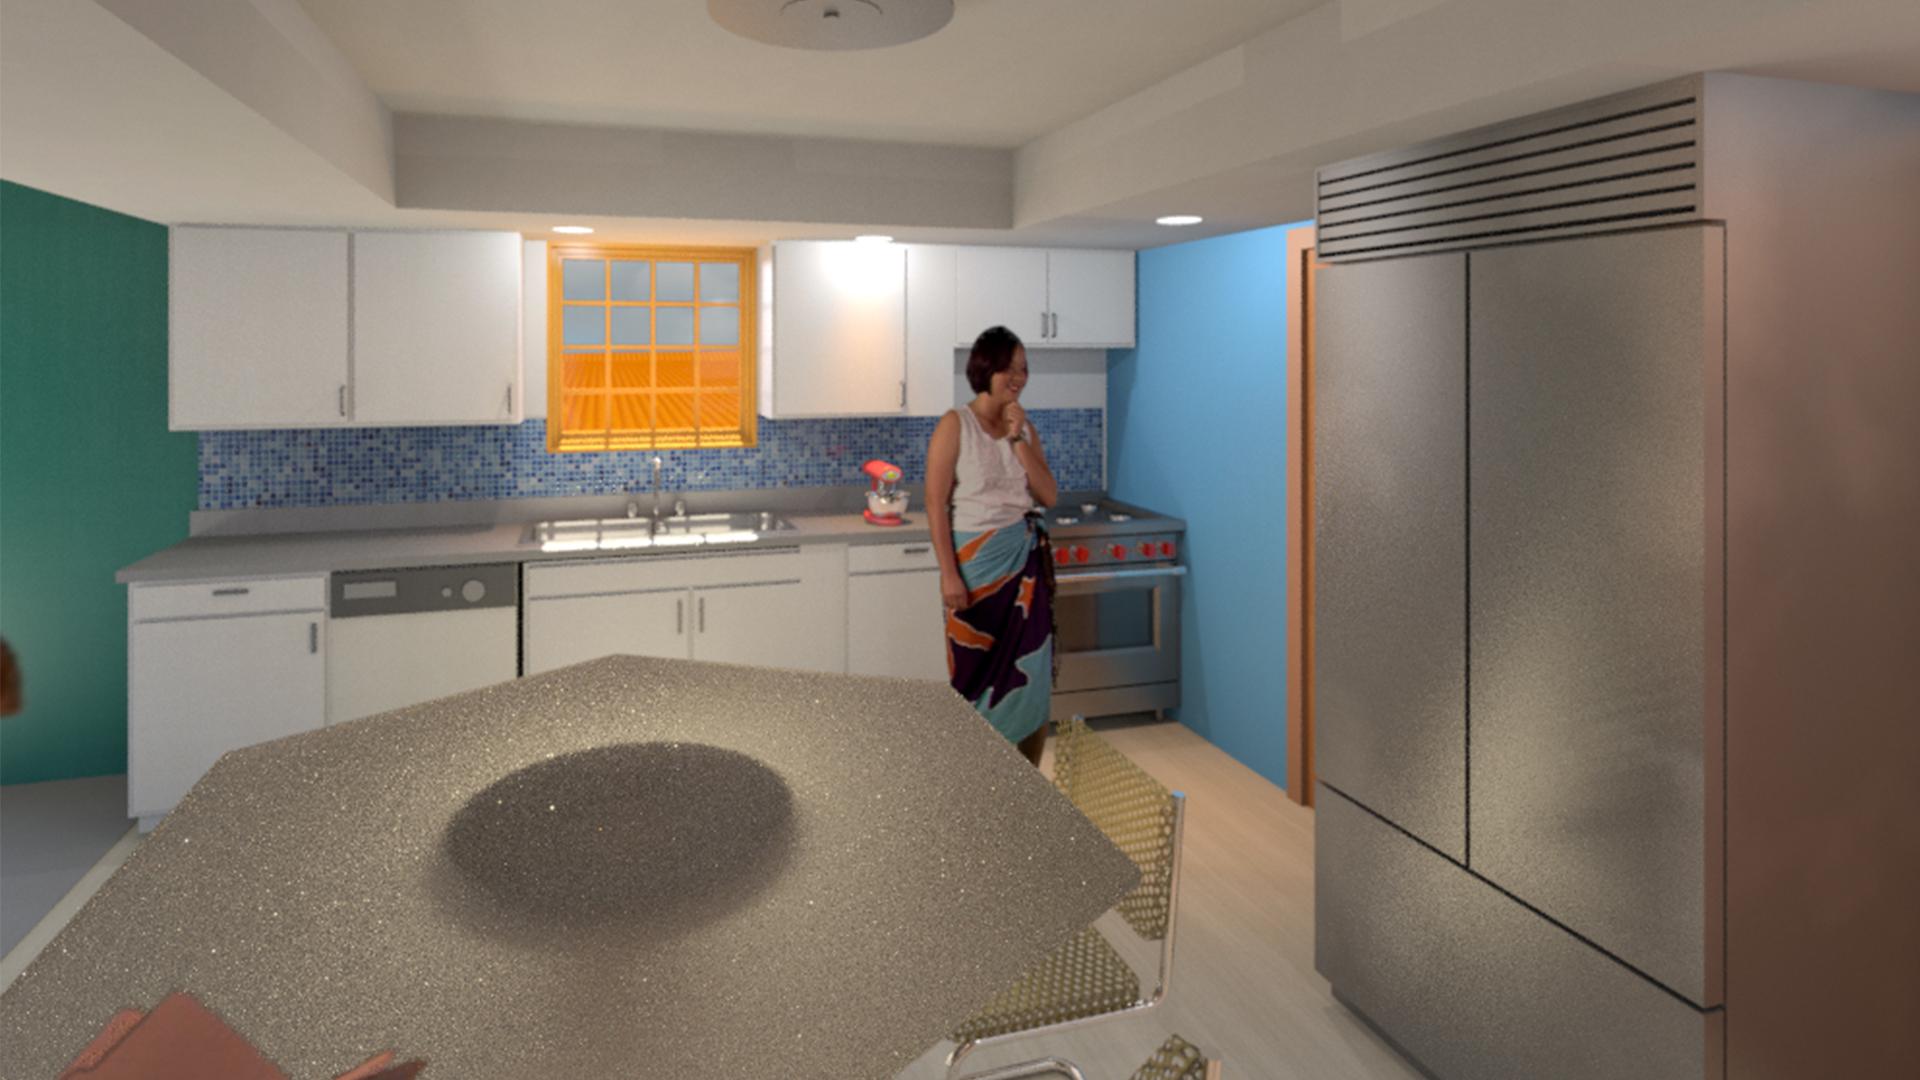 Revit: Interior Design Project Techniques